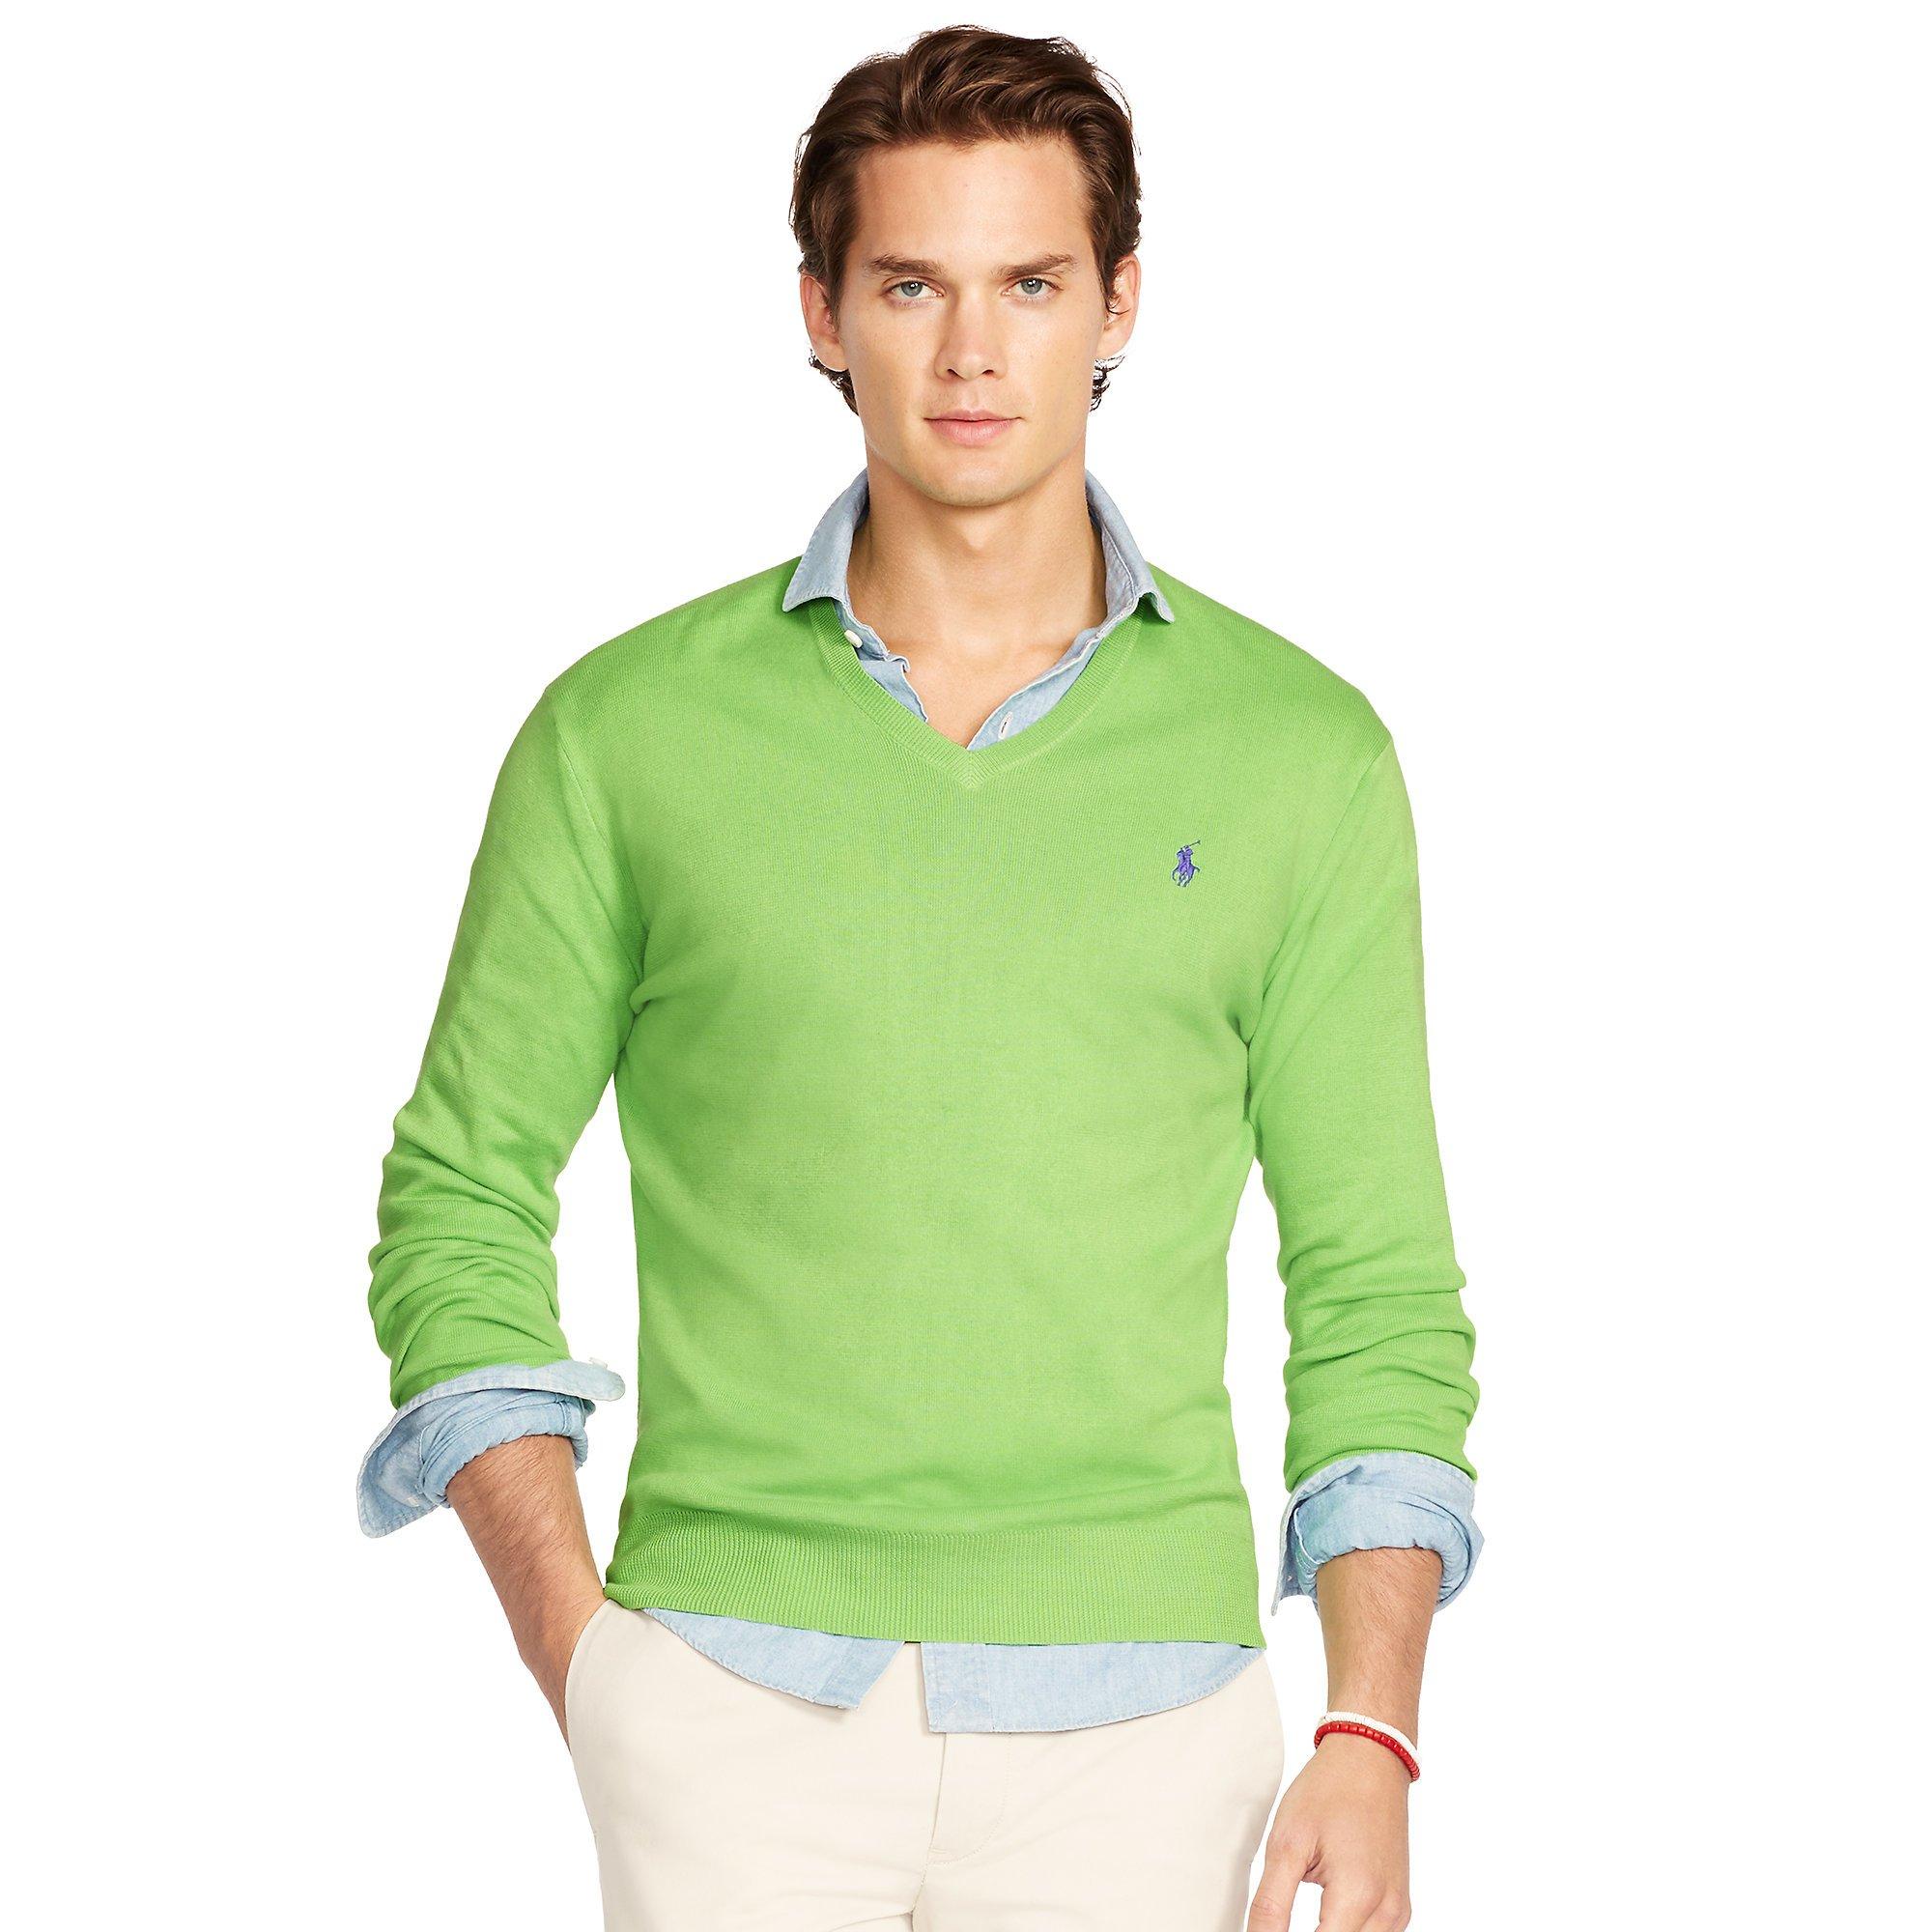 lyst polo ralph lauren pima cotton v neck sweater in green for men. Black Bedroom Furniture Sets. Home Design Ideas